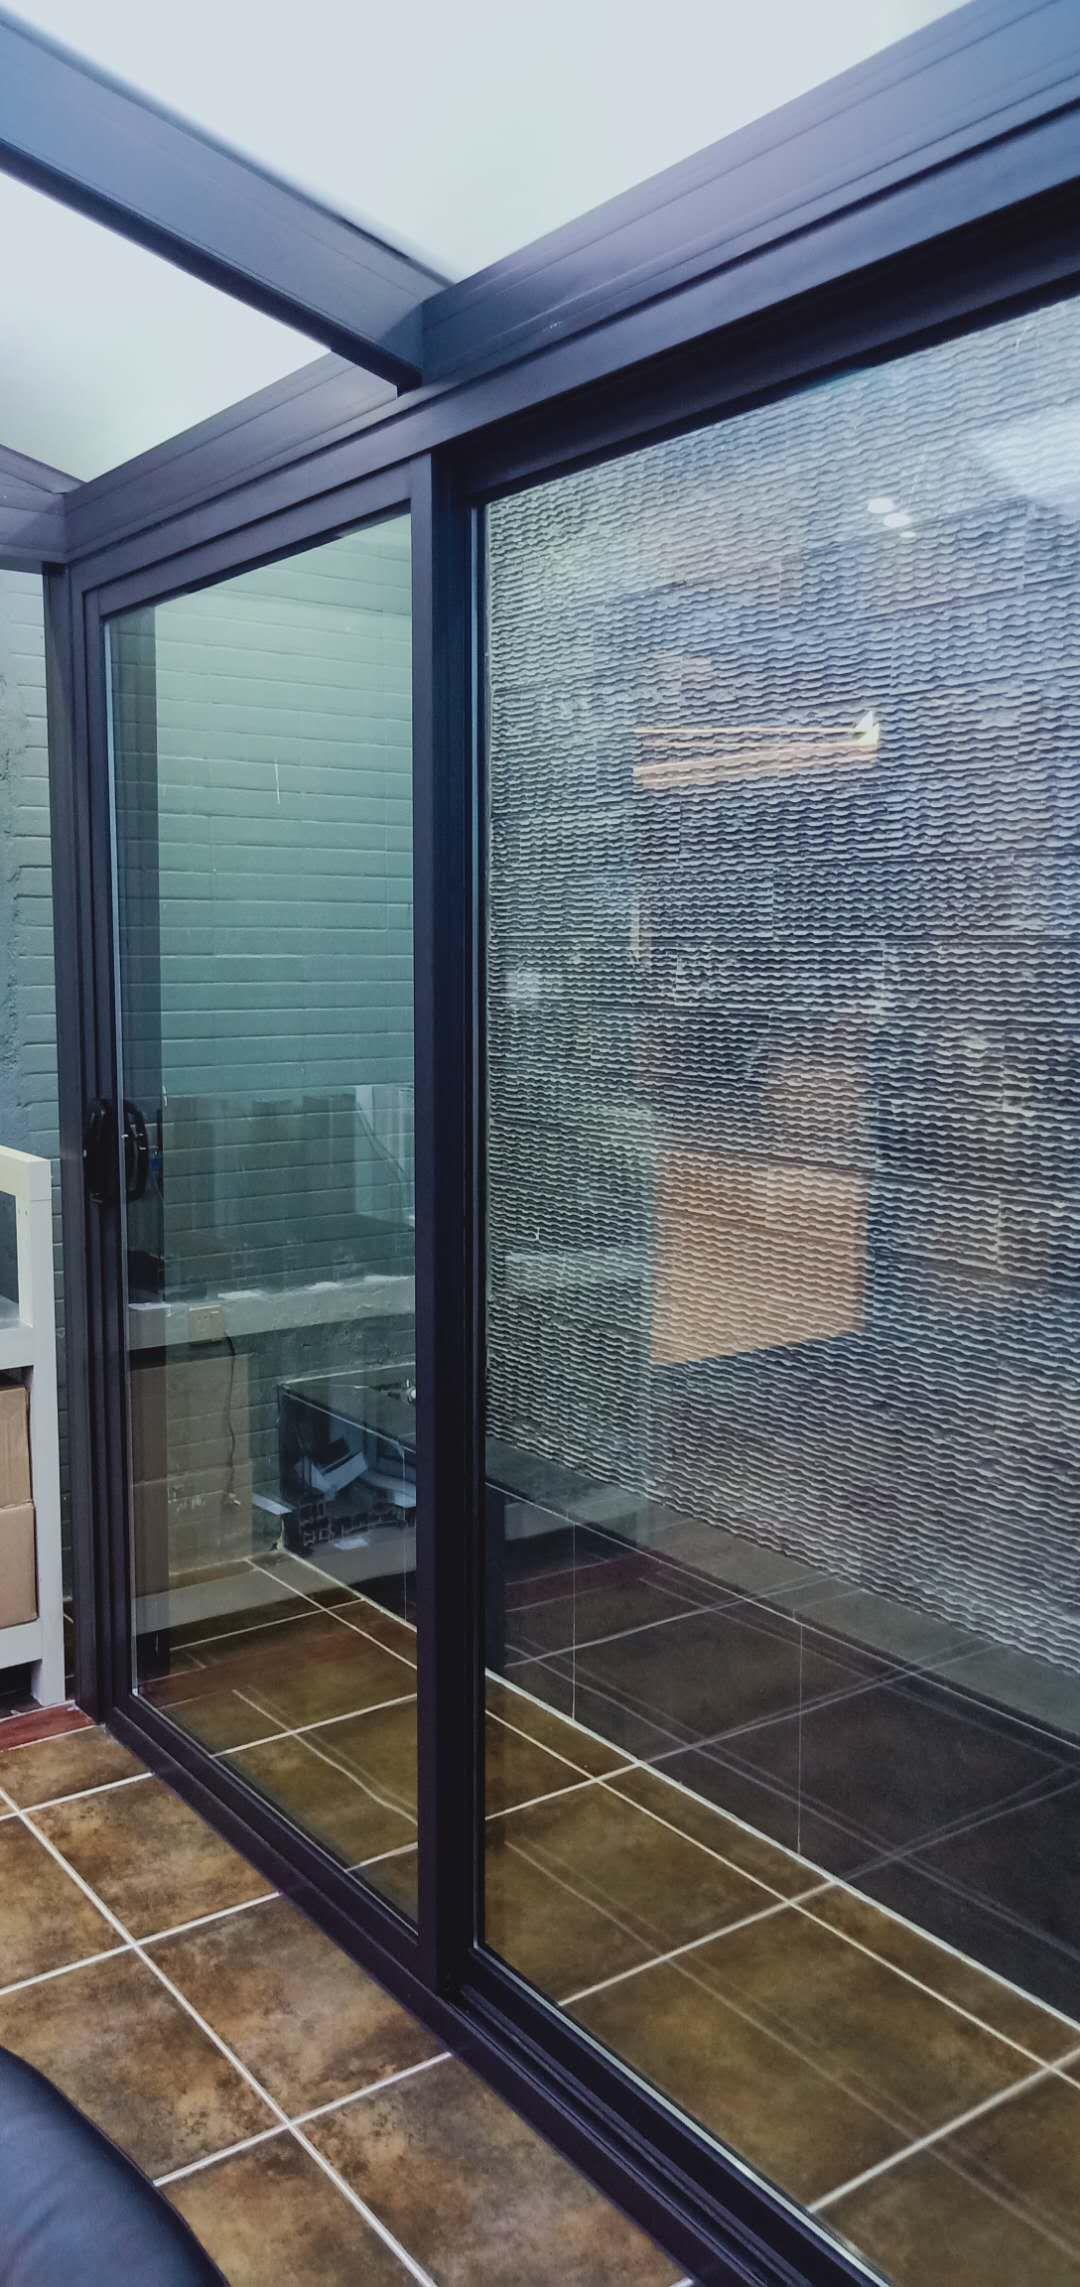 Ht102 Sliding Door In 2020 Aluminium Sliding Doors Sliding Doors Sliding Glass Door